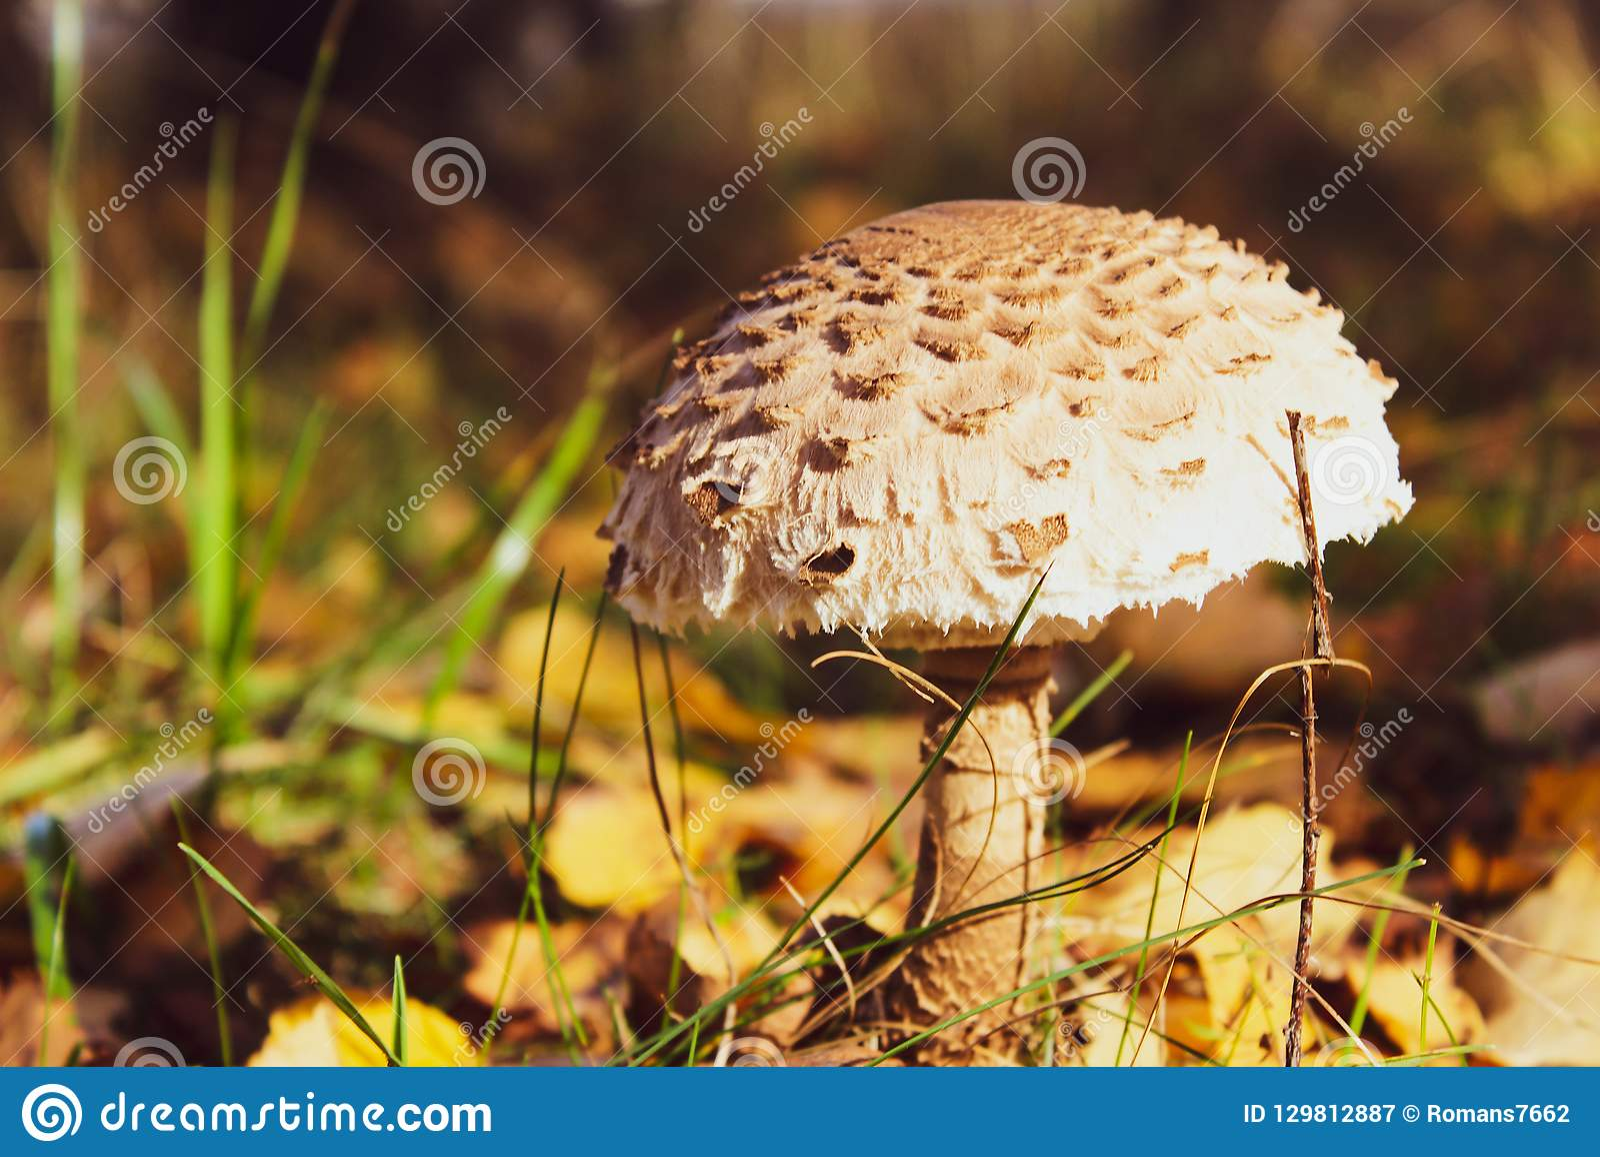 Autumn beautiful forest edible mushroom